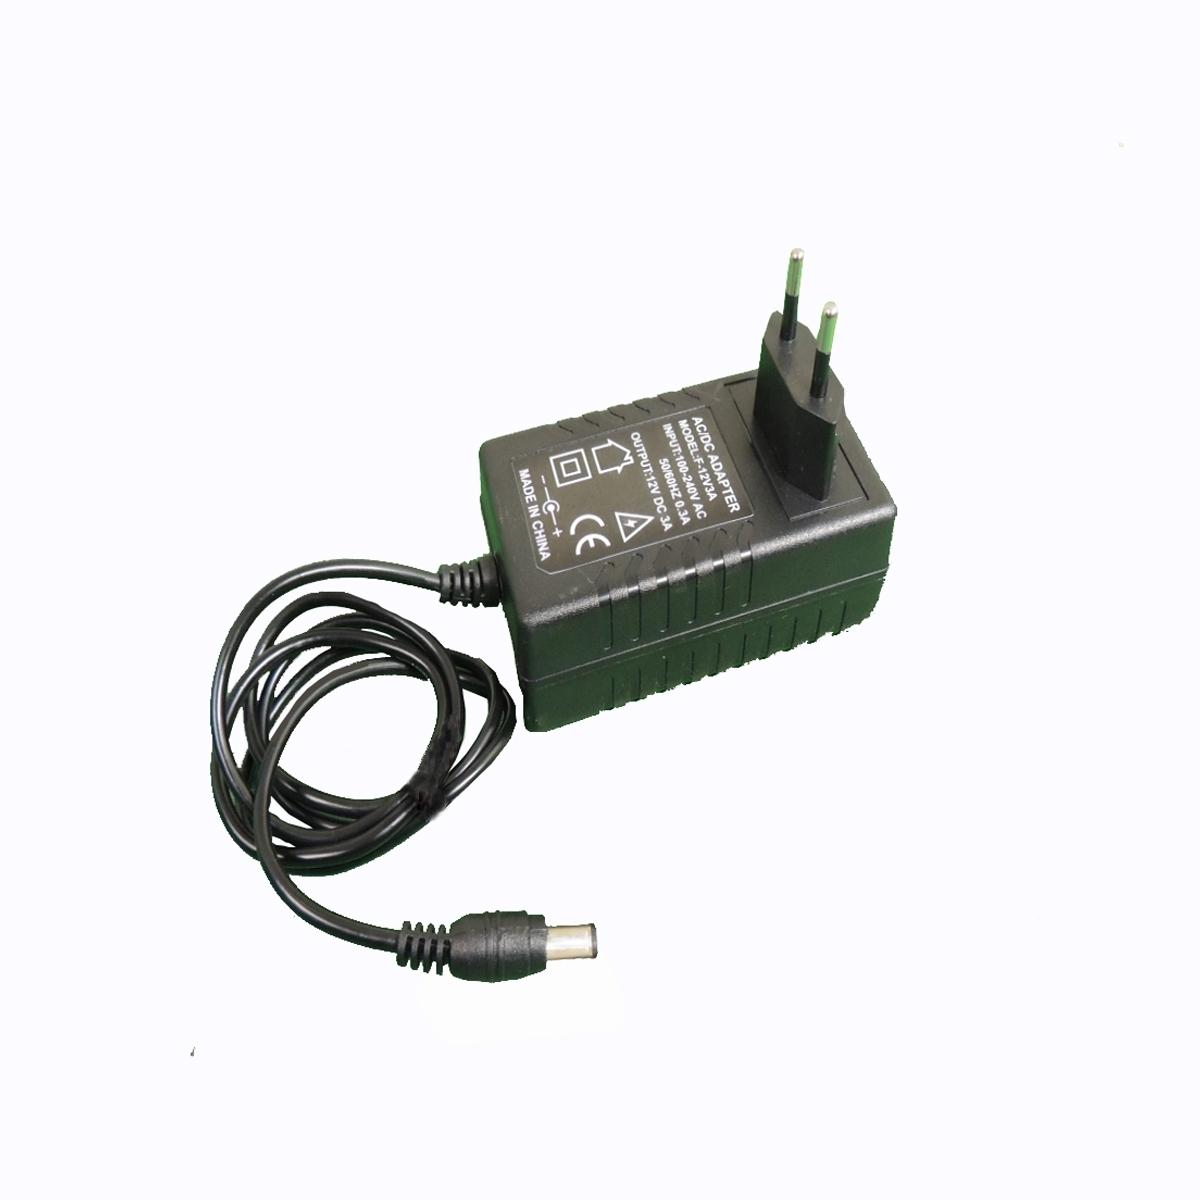 FONTE 12V ELETRONICA 3.0A 35W BIVOLT - i9 LED